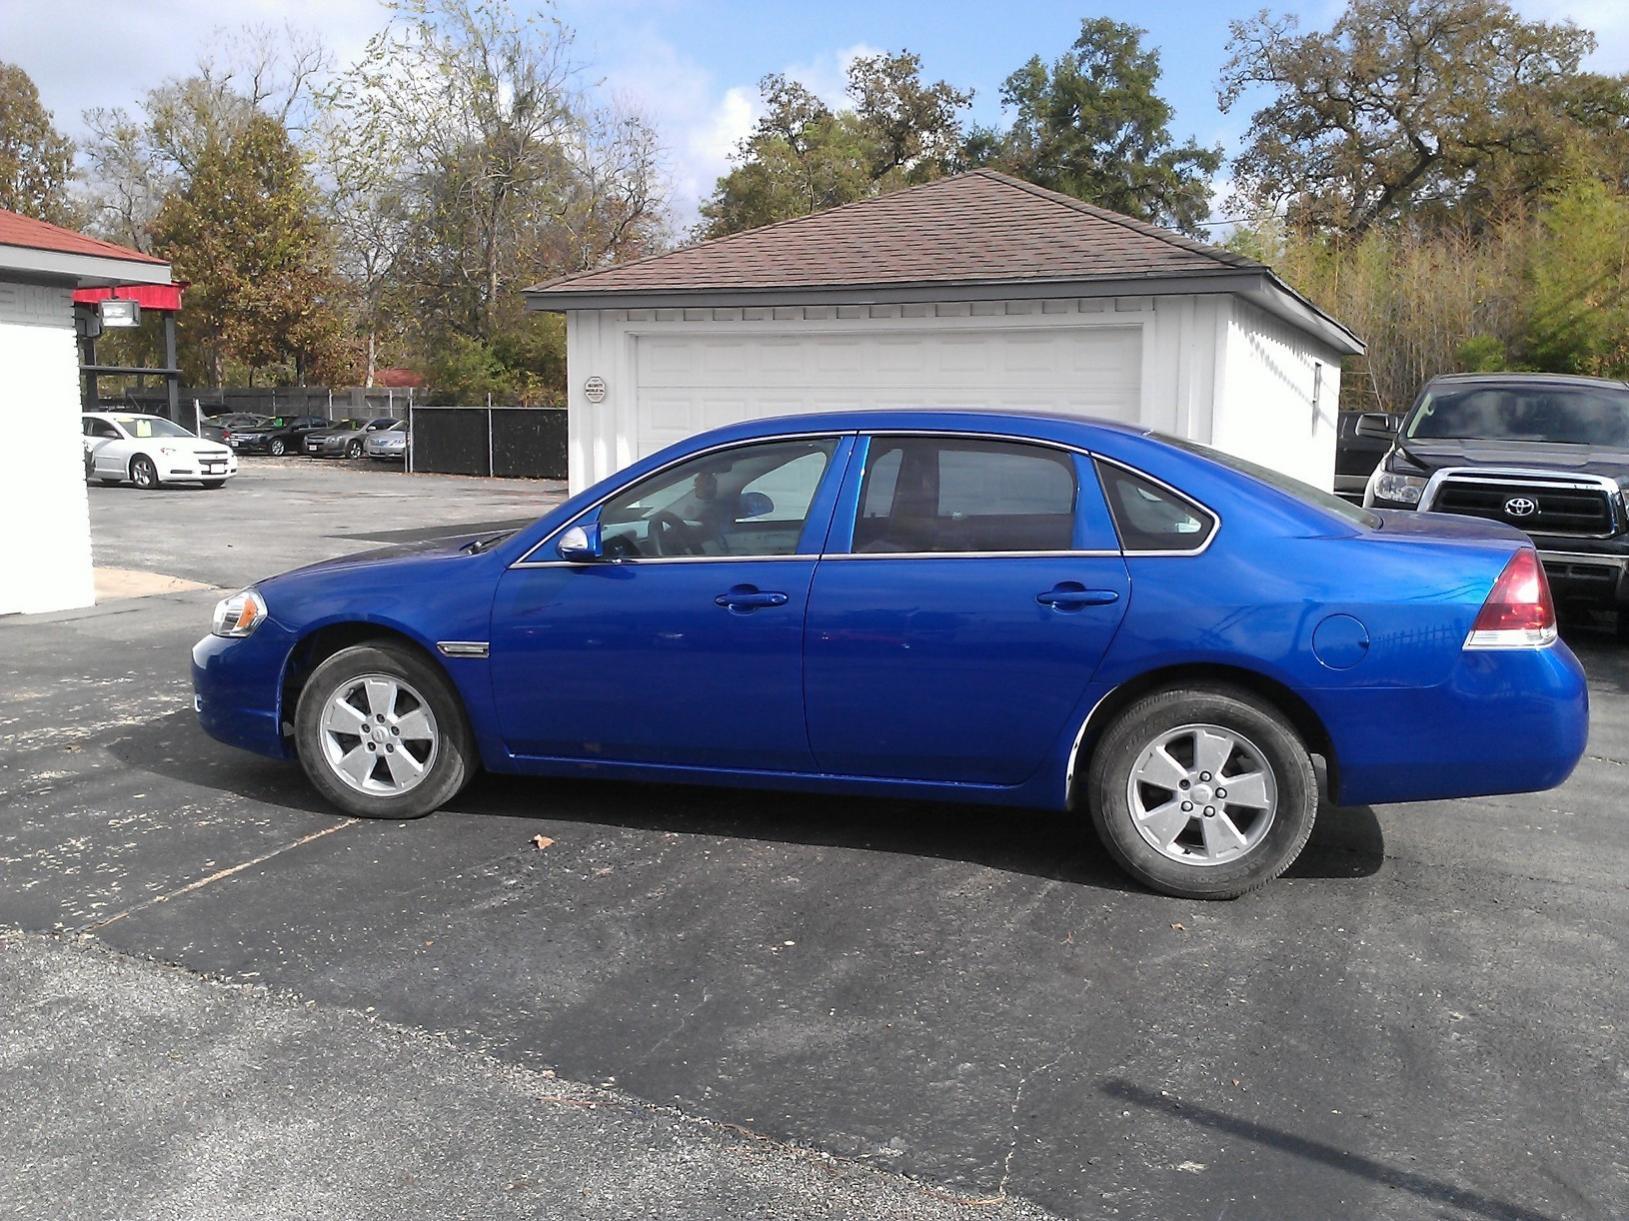 Candy Blue 06 Impala X2 Chevy Impala Forums